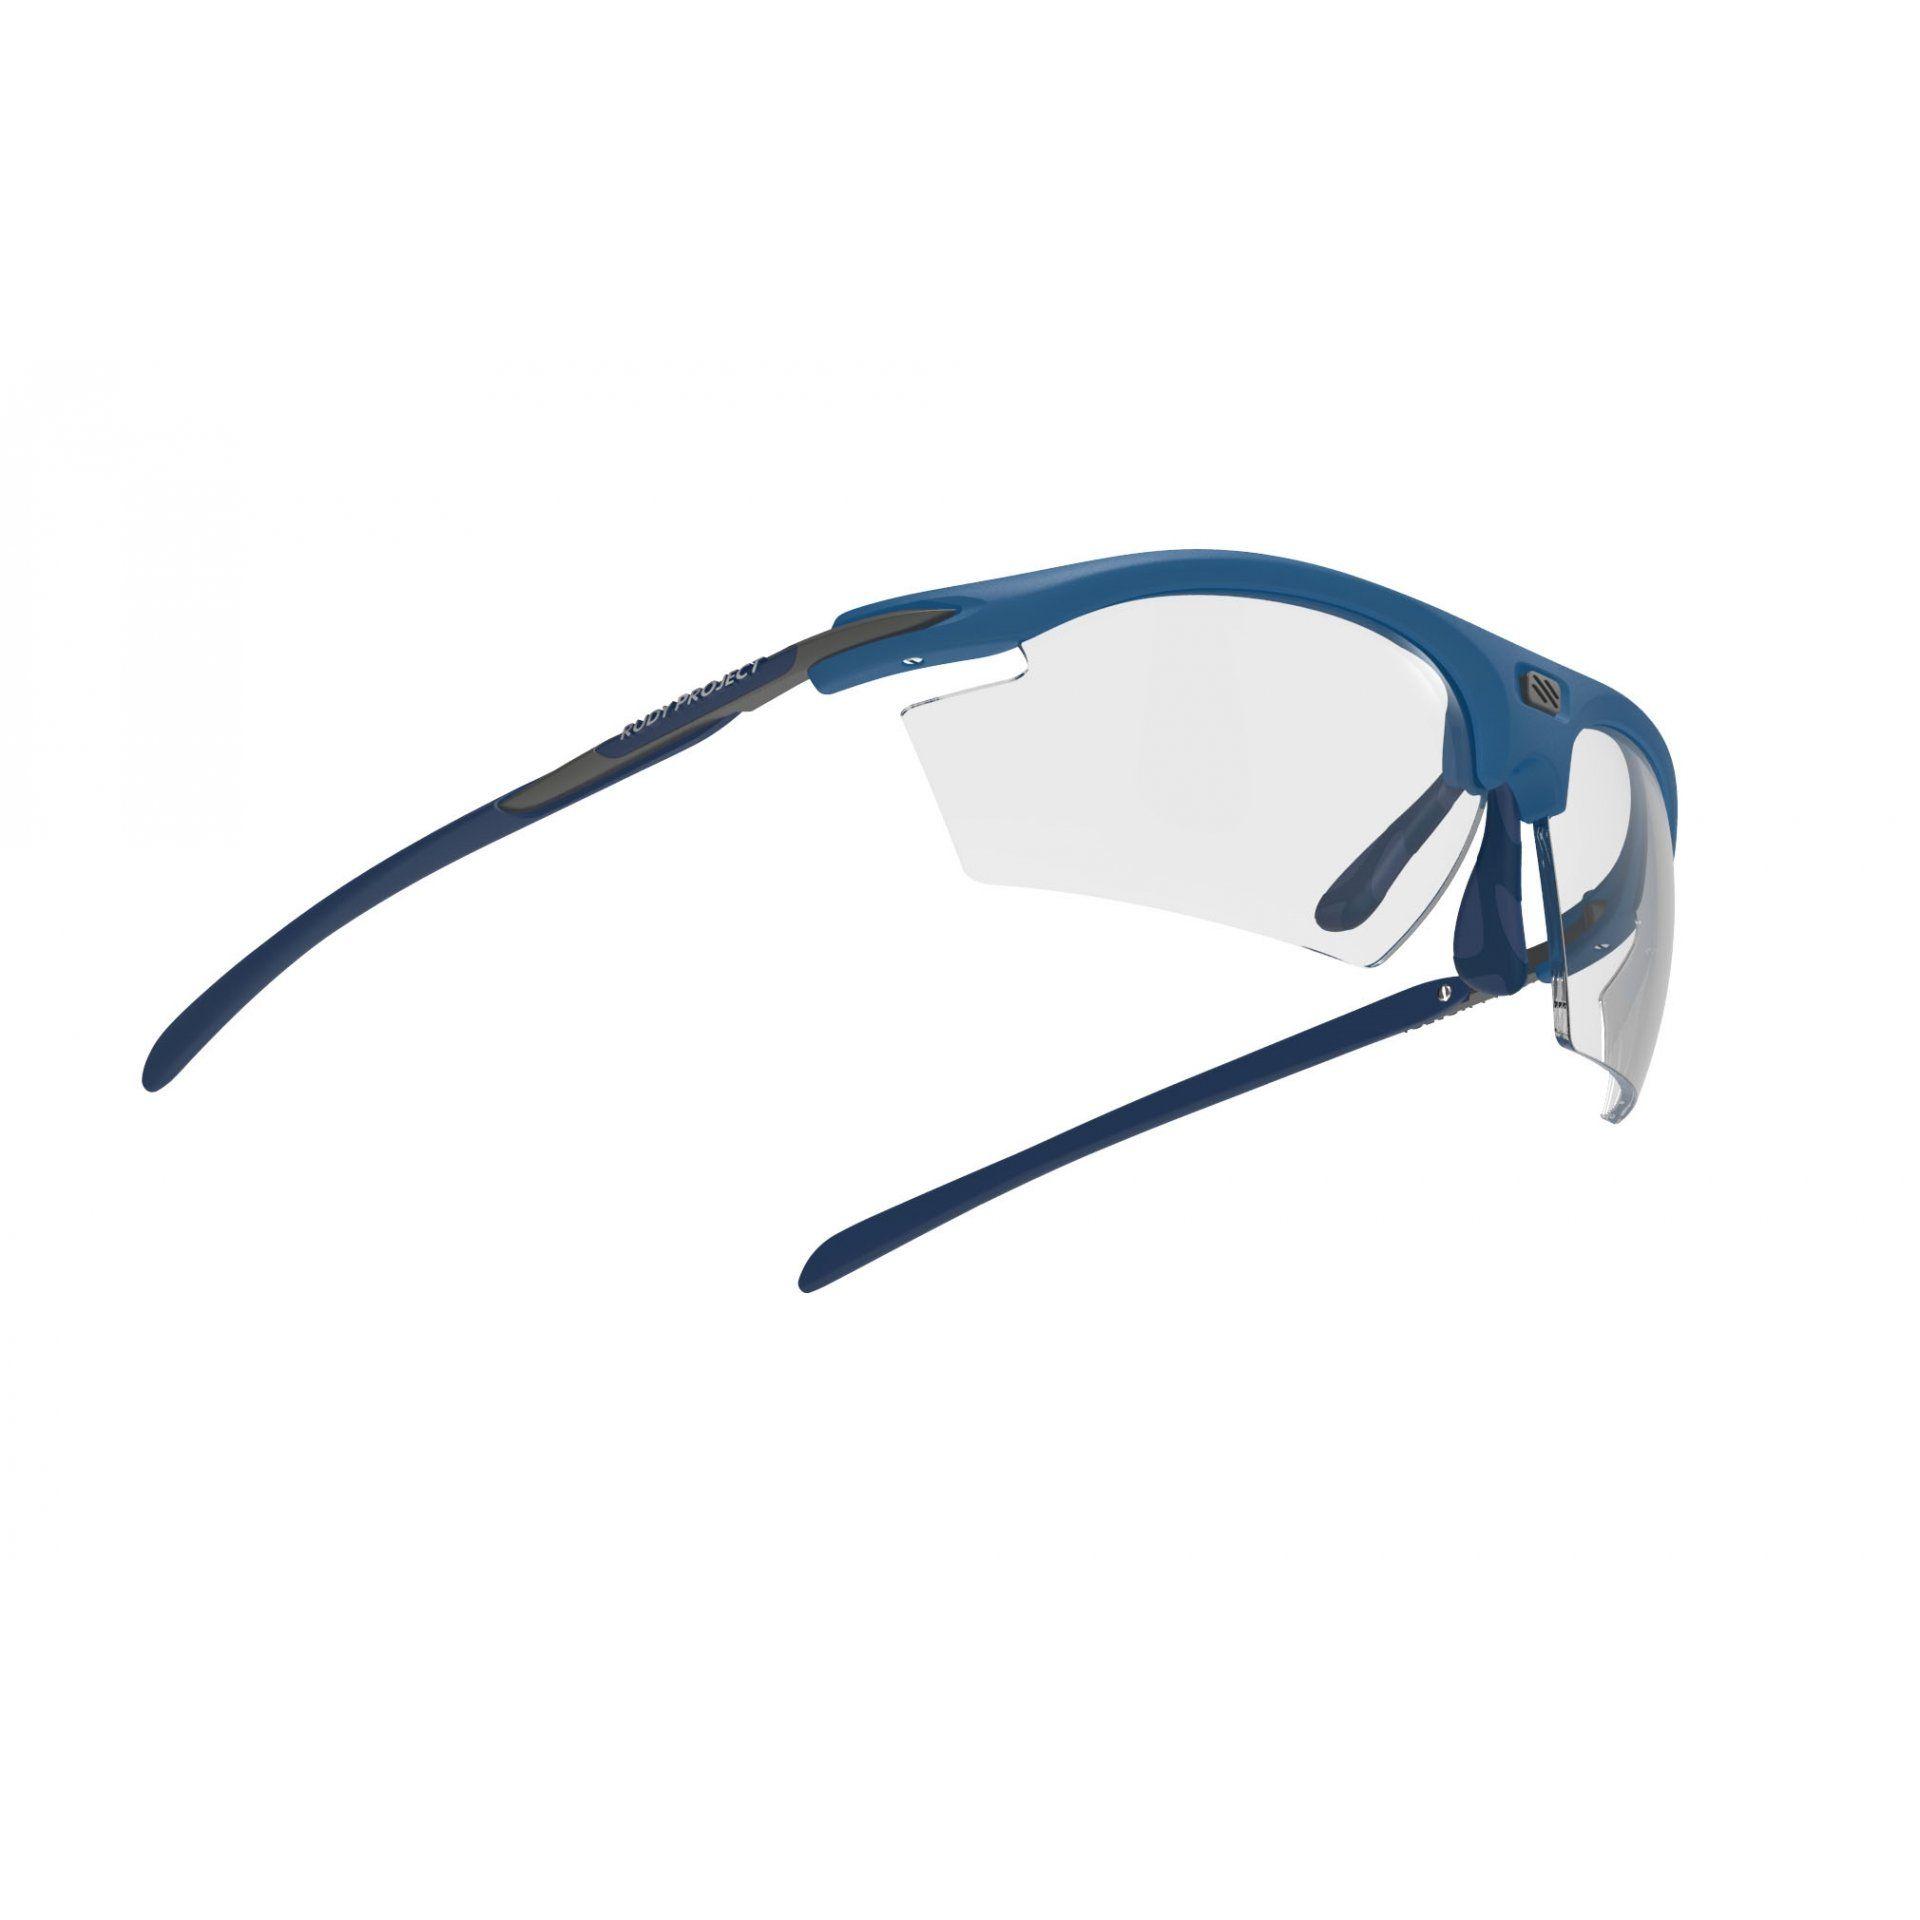 OKULARY RUDY PROJECT RYDON PACIFIC BLUE MATTE+PHOTOCHROMIC BLACK 3